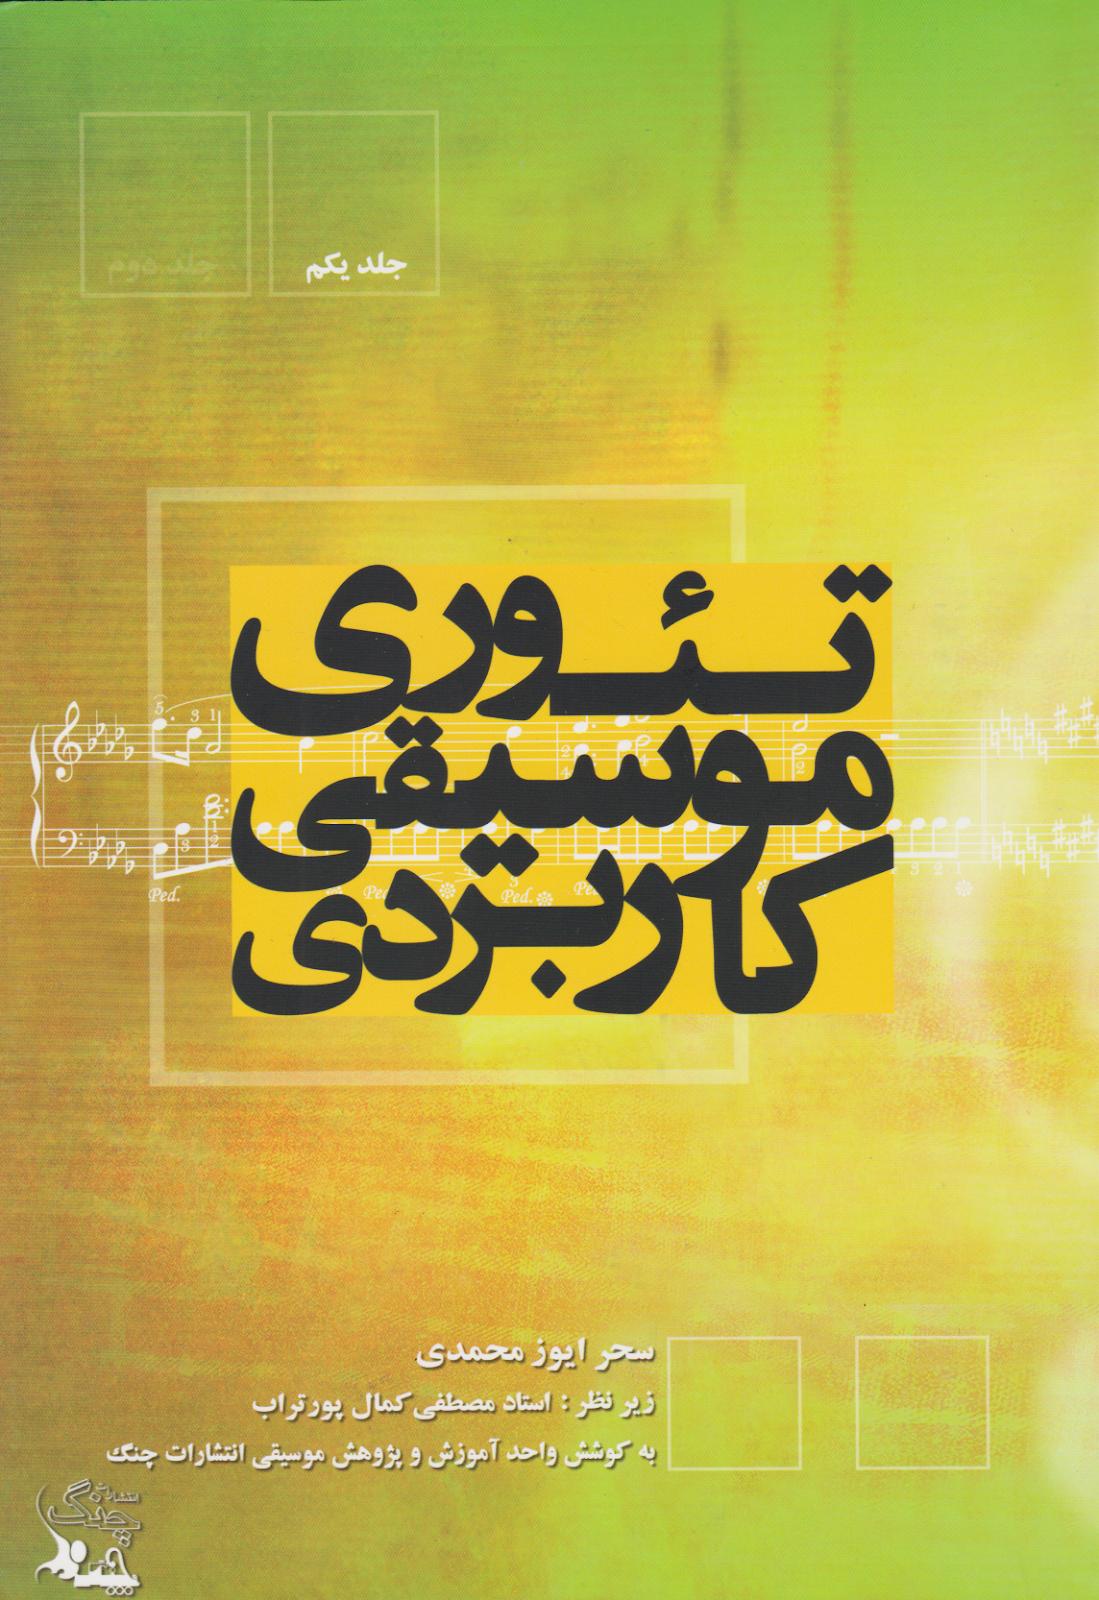 کتاب اول تئوری موسیقی کاربردی سحر ایوز محمدی انتشارات چنگ